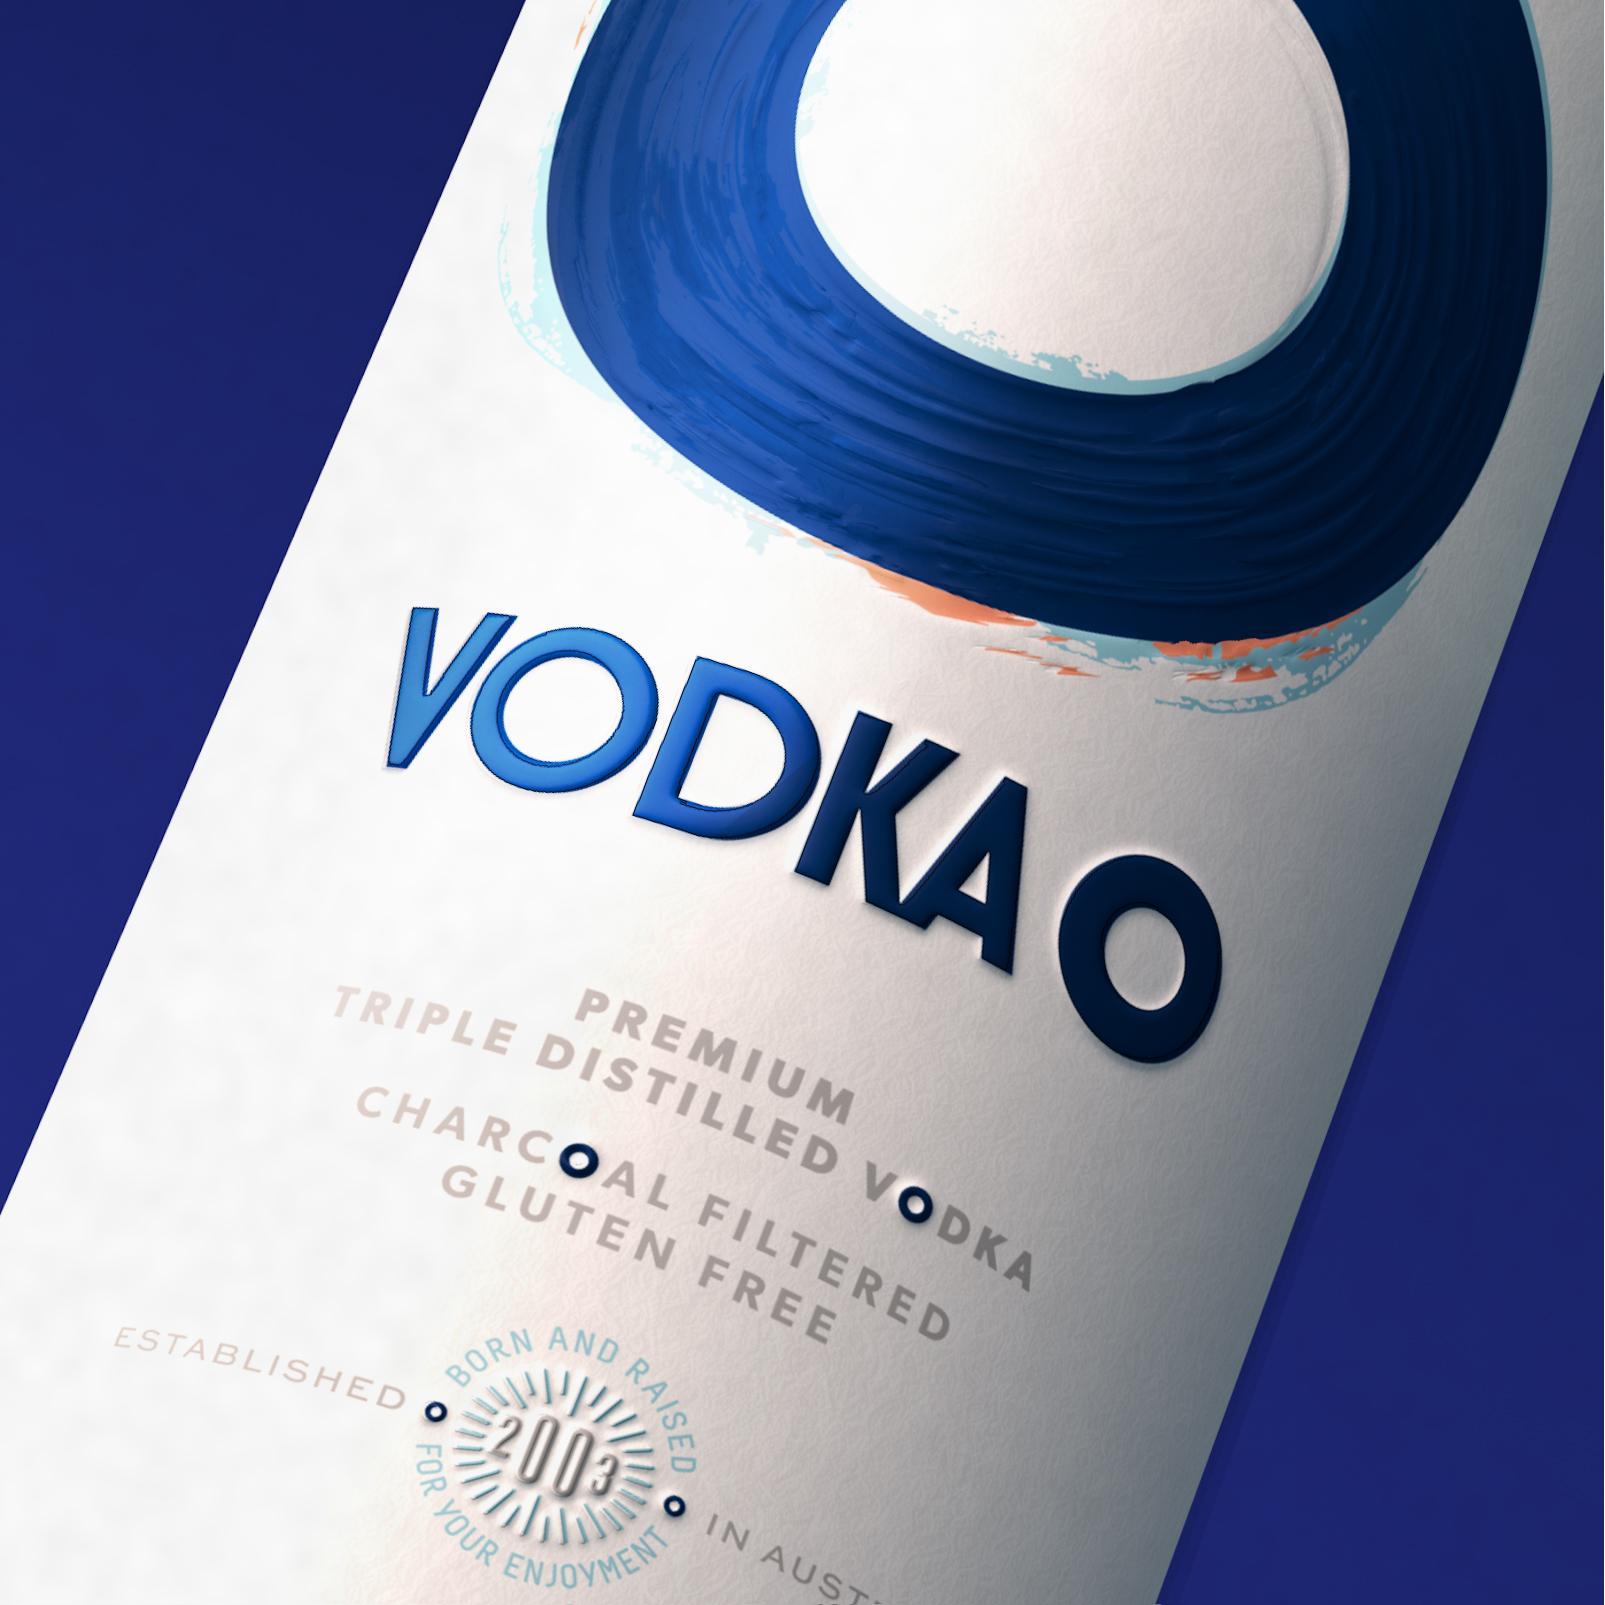 VodkaO-Thumb.jpg